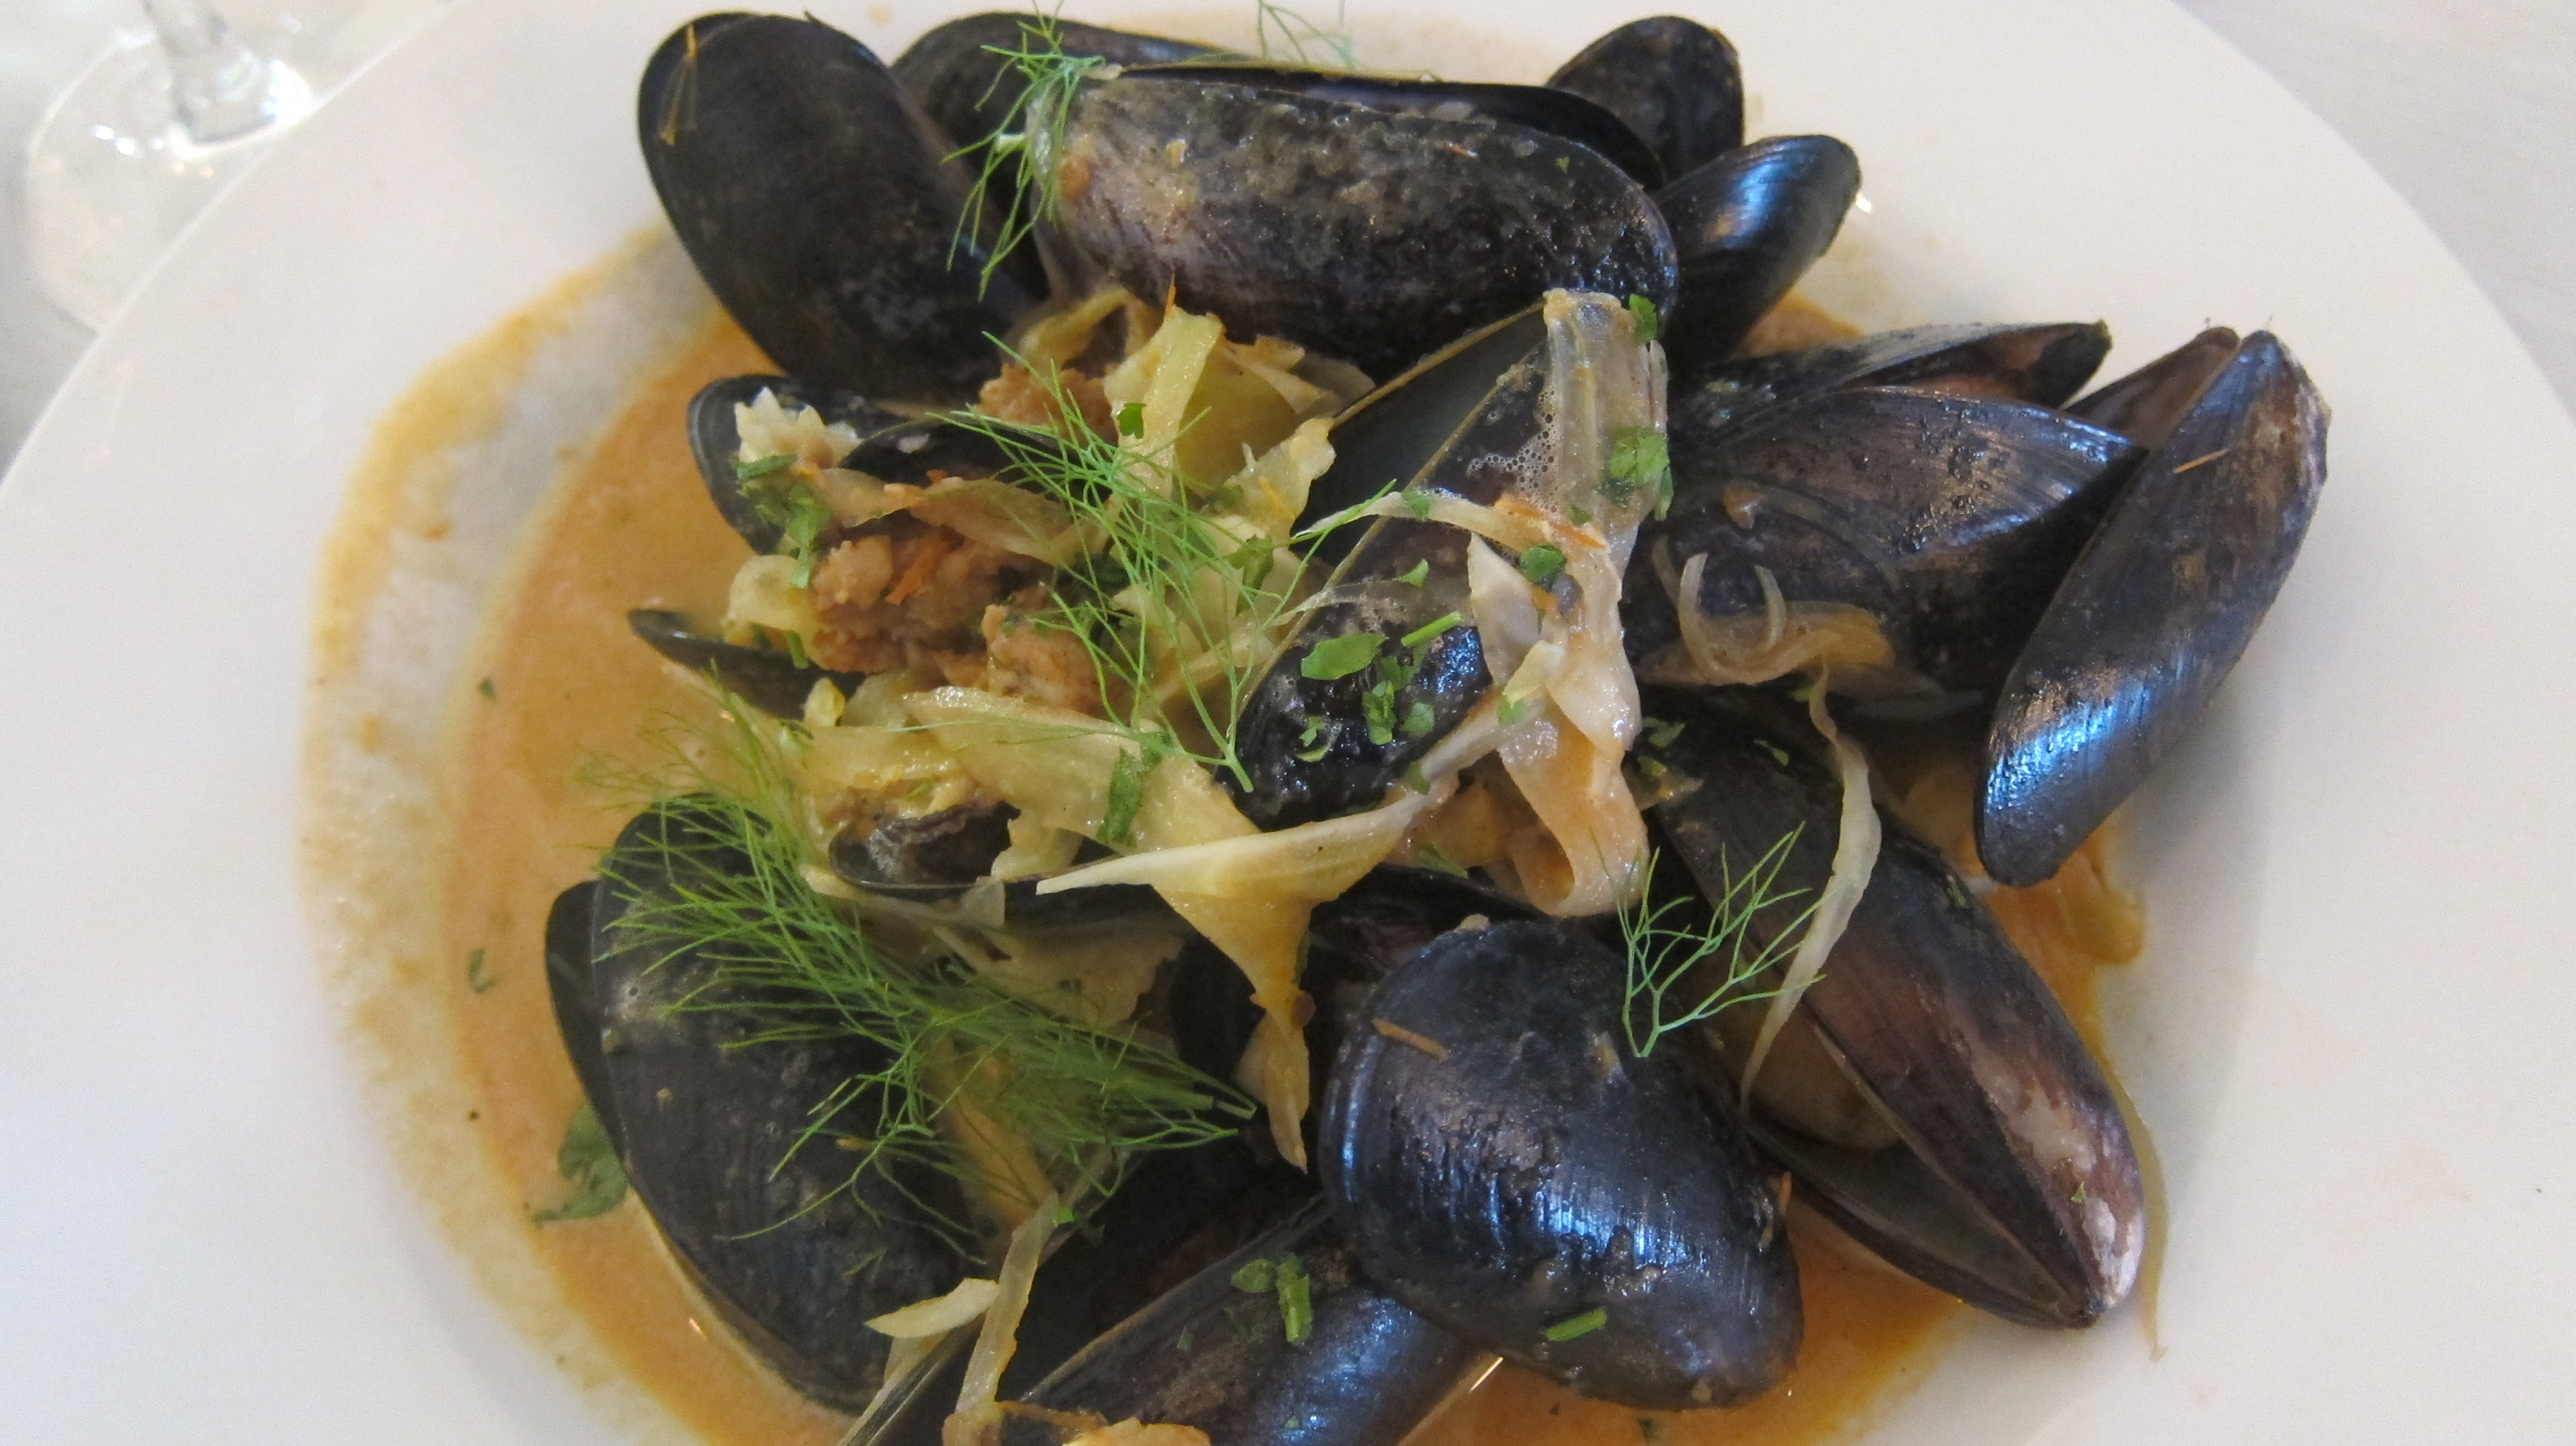 MUSSELS & SAUSAGE - Tomato Jam, Veal Jus, Pork Sausage, Garlic Confit.